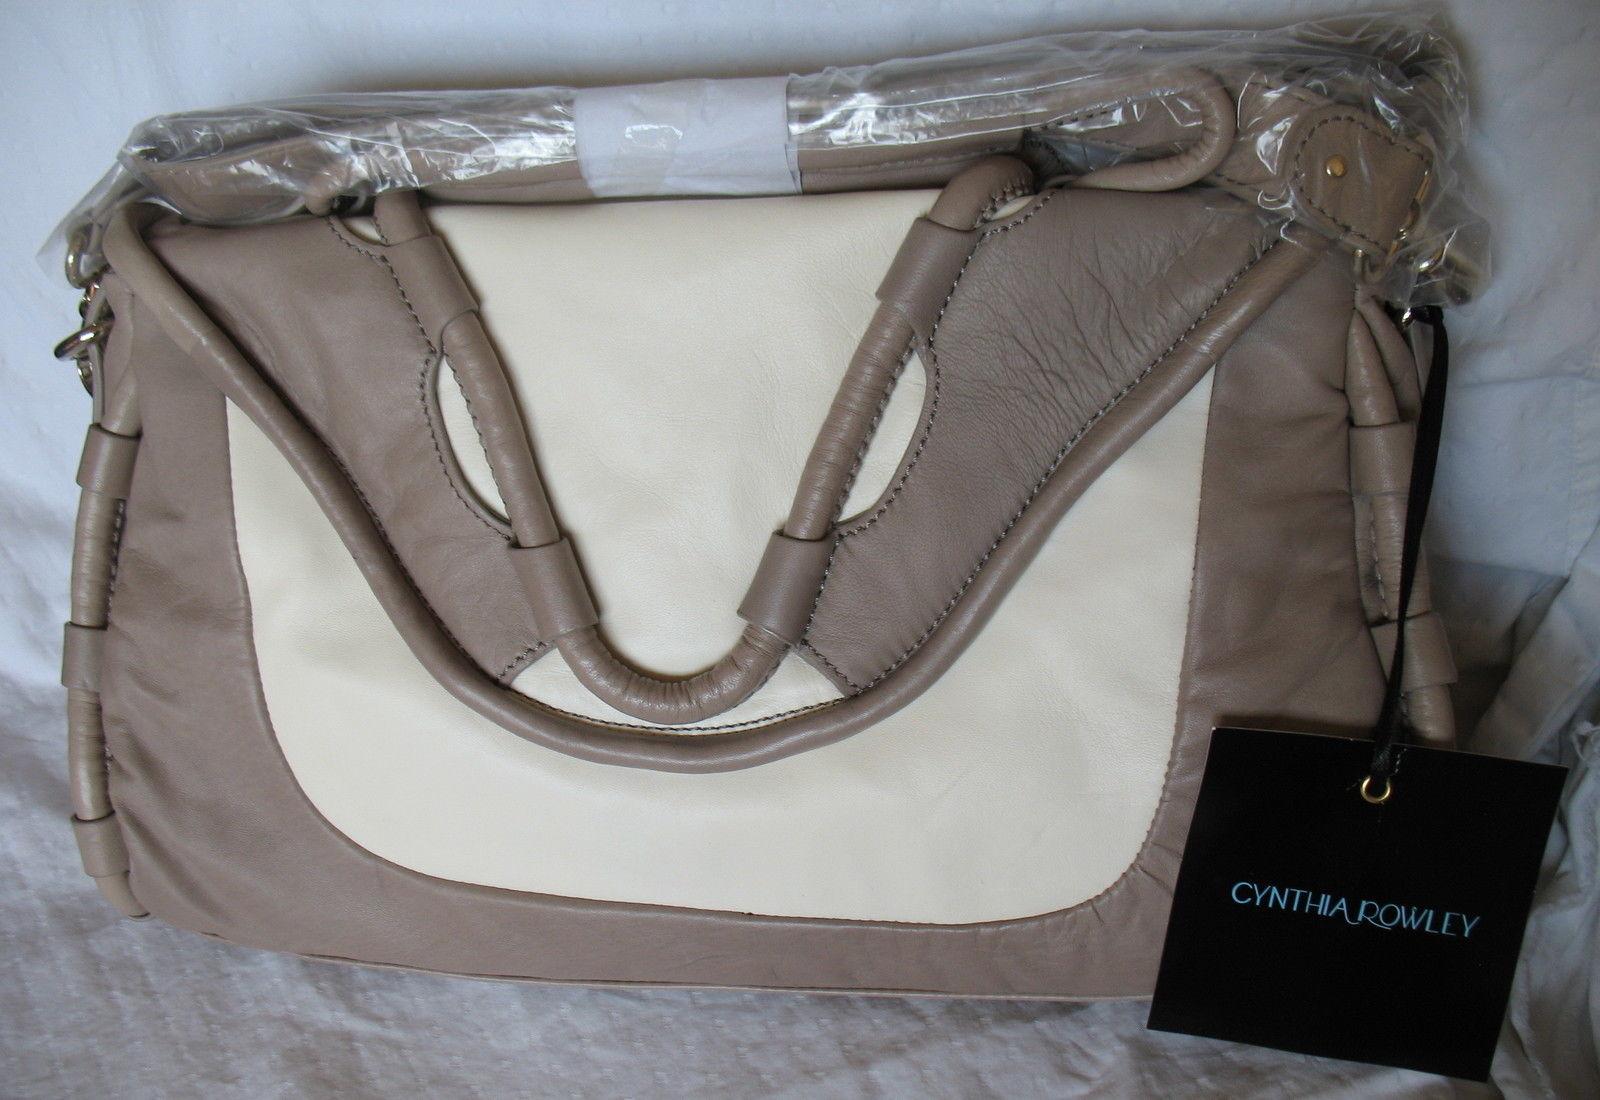 Cynthia Rowley Purse New Handbag Calloway Gray White Crossbody Leather Ash Color